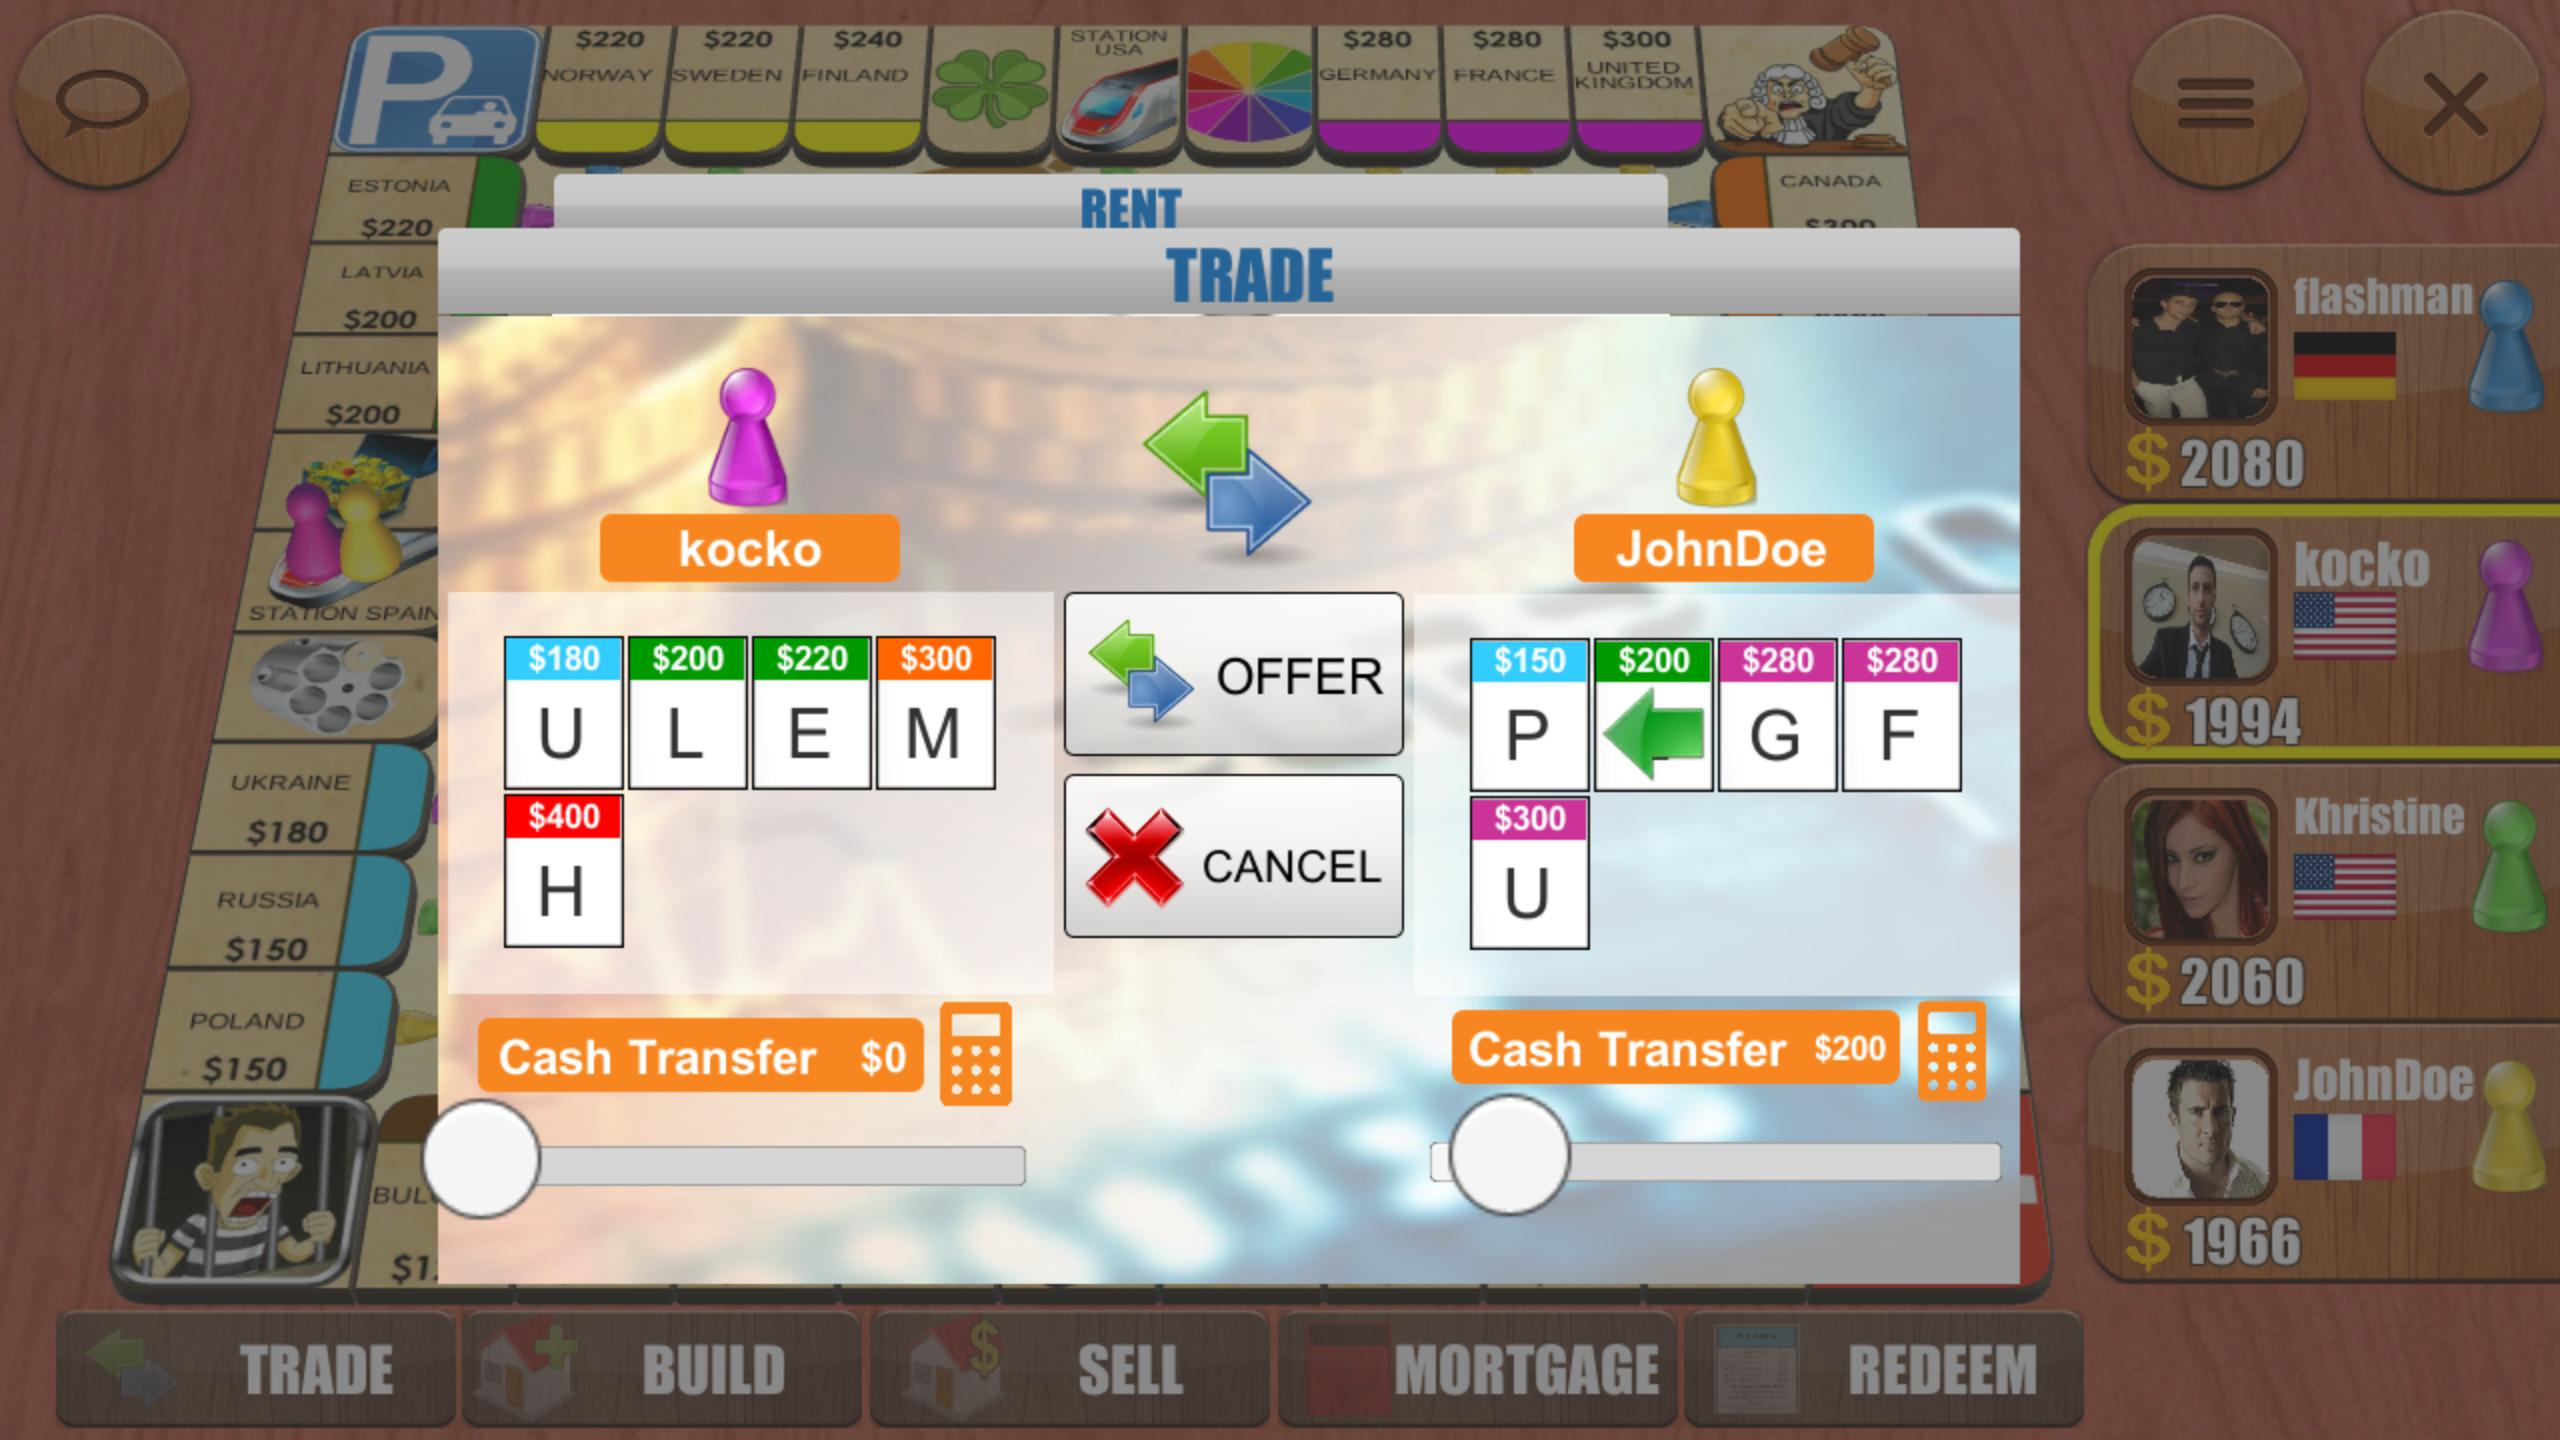 Rento Dice Board Game Online 5.1.9 Screenshot 19